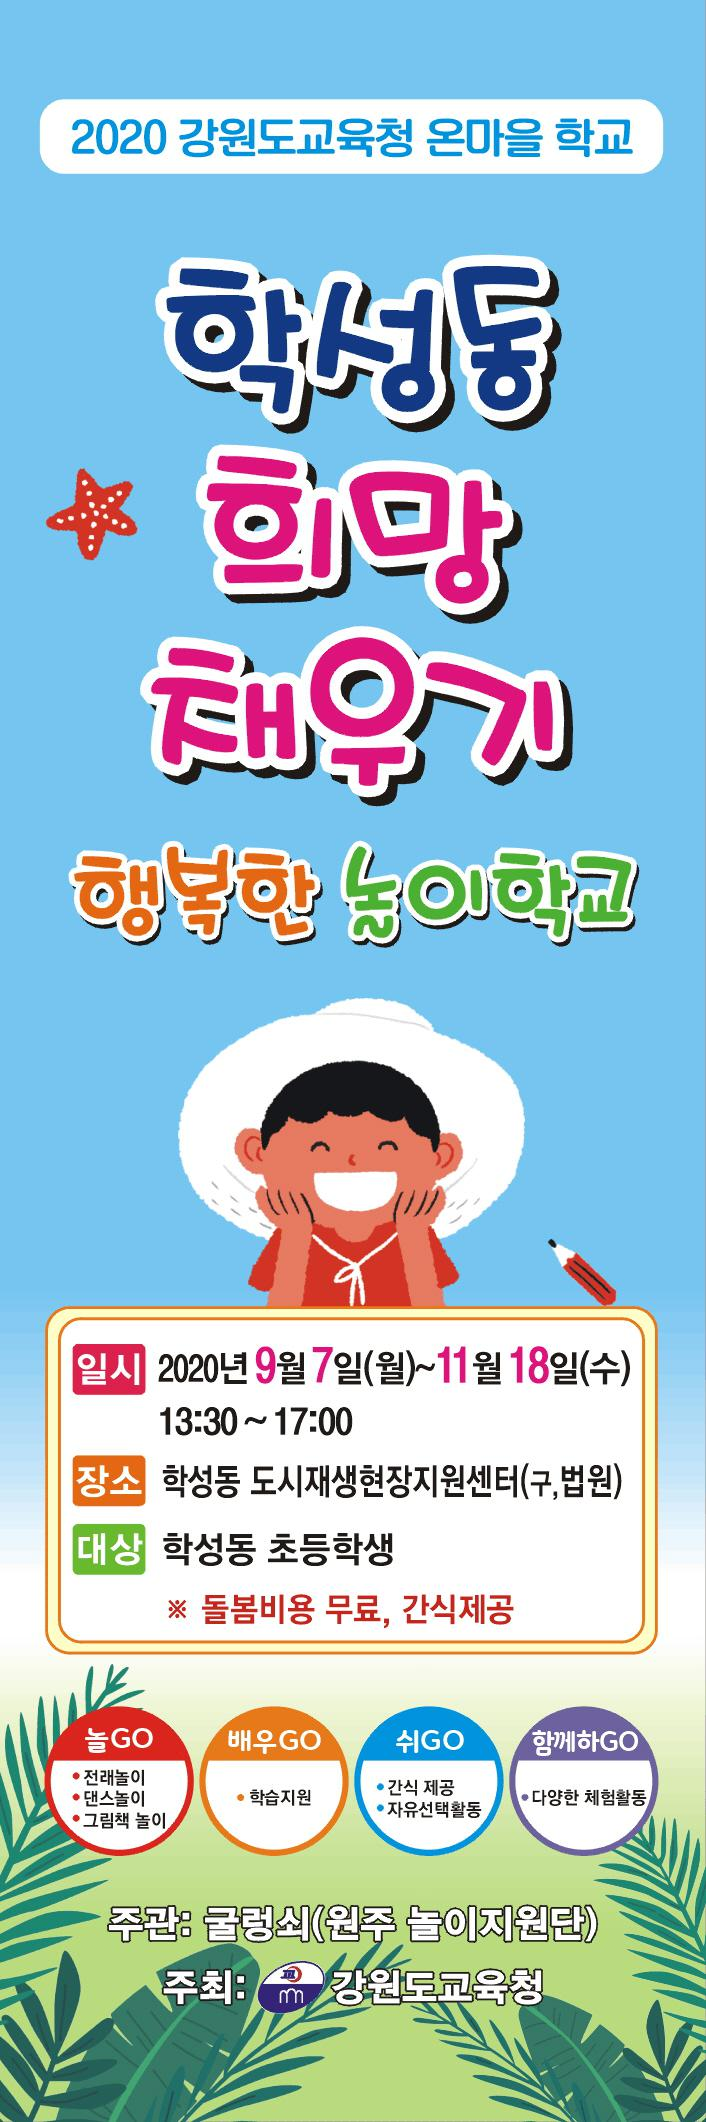 images on organization : 원주학부모지원센터